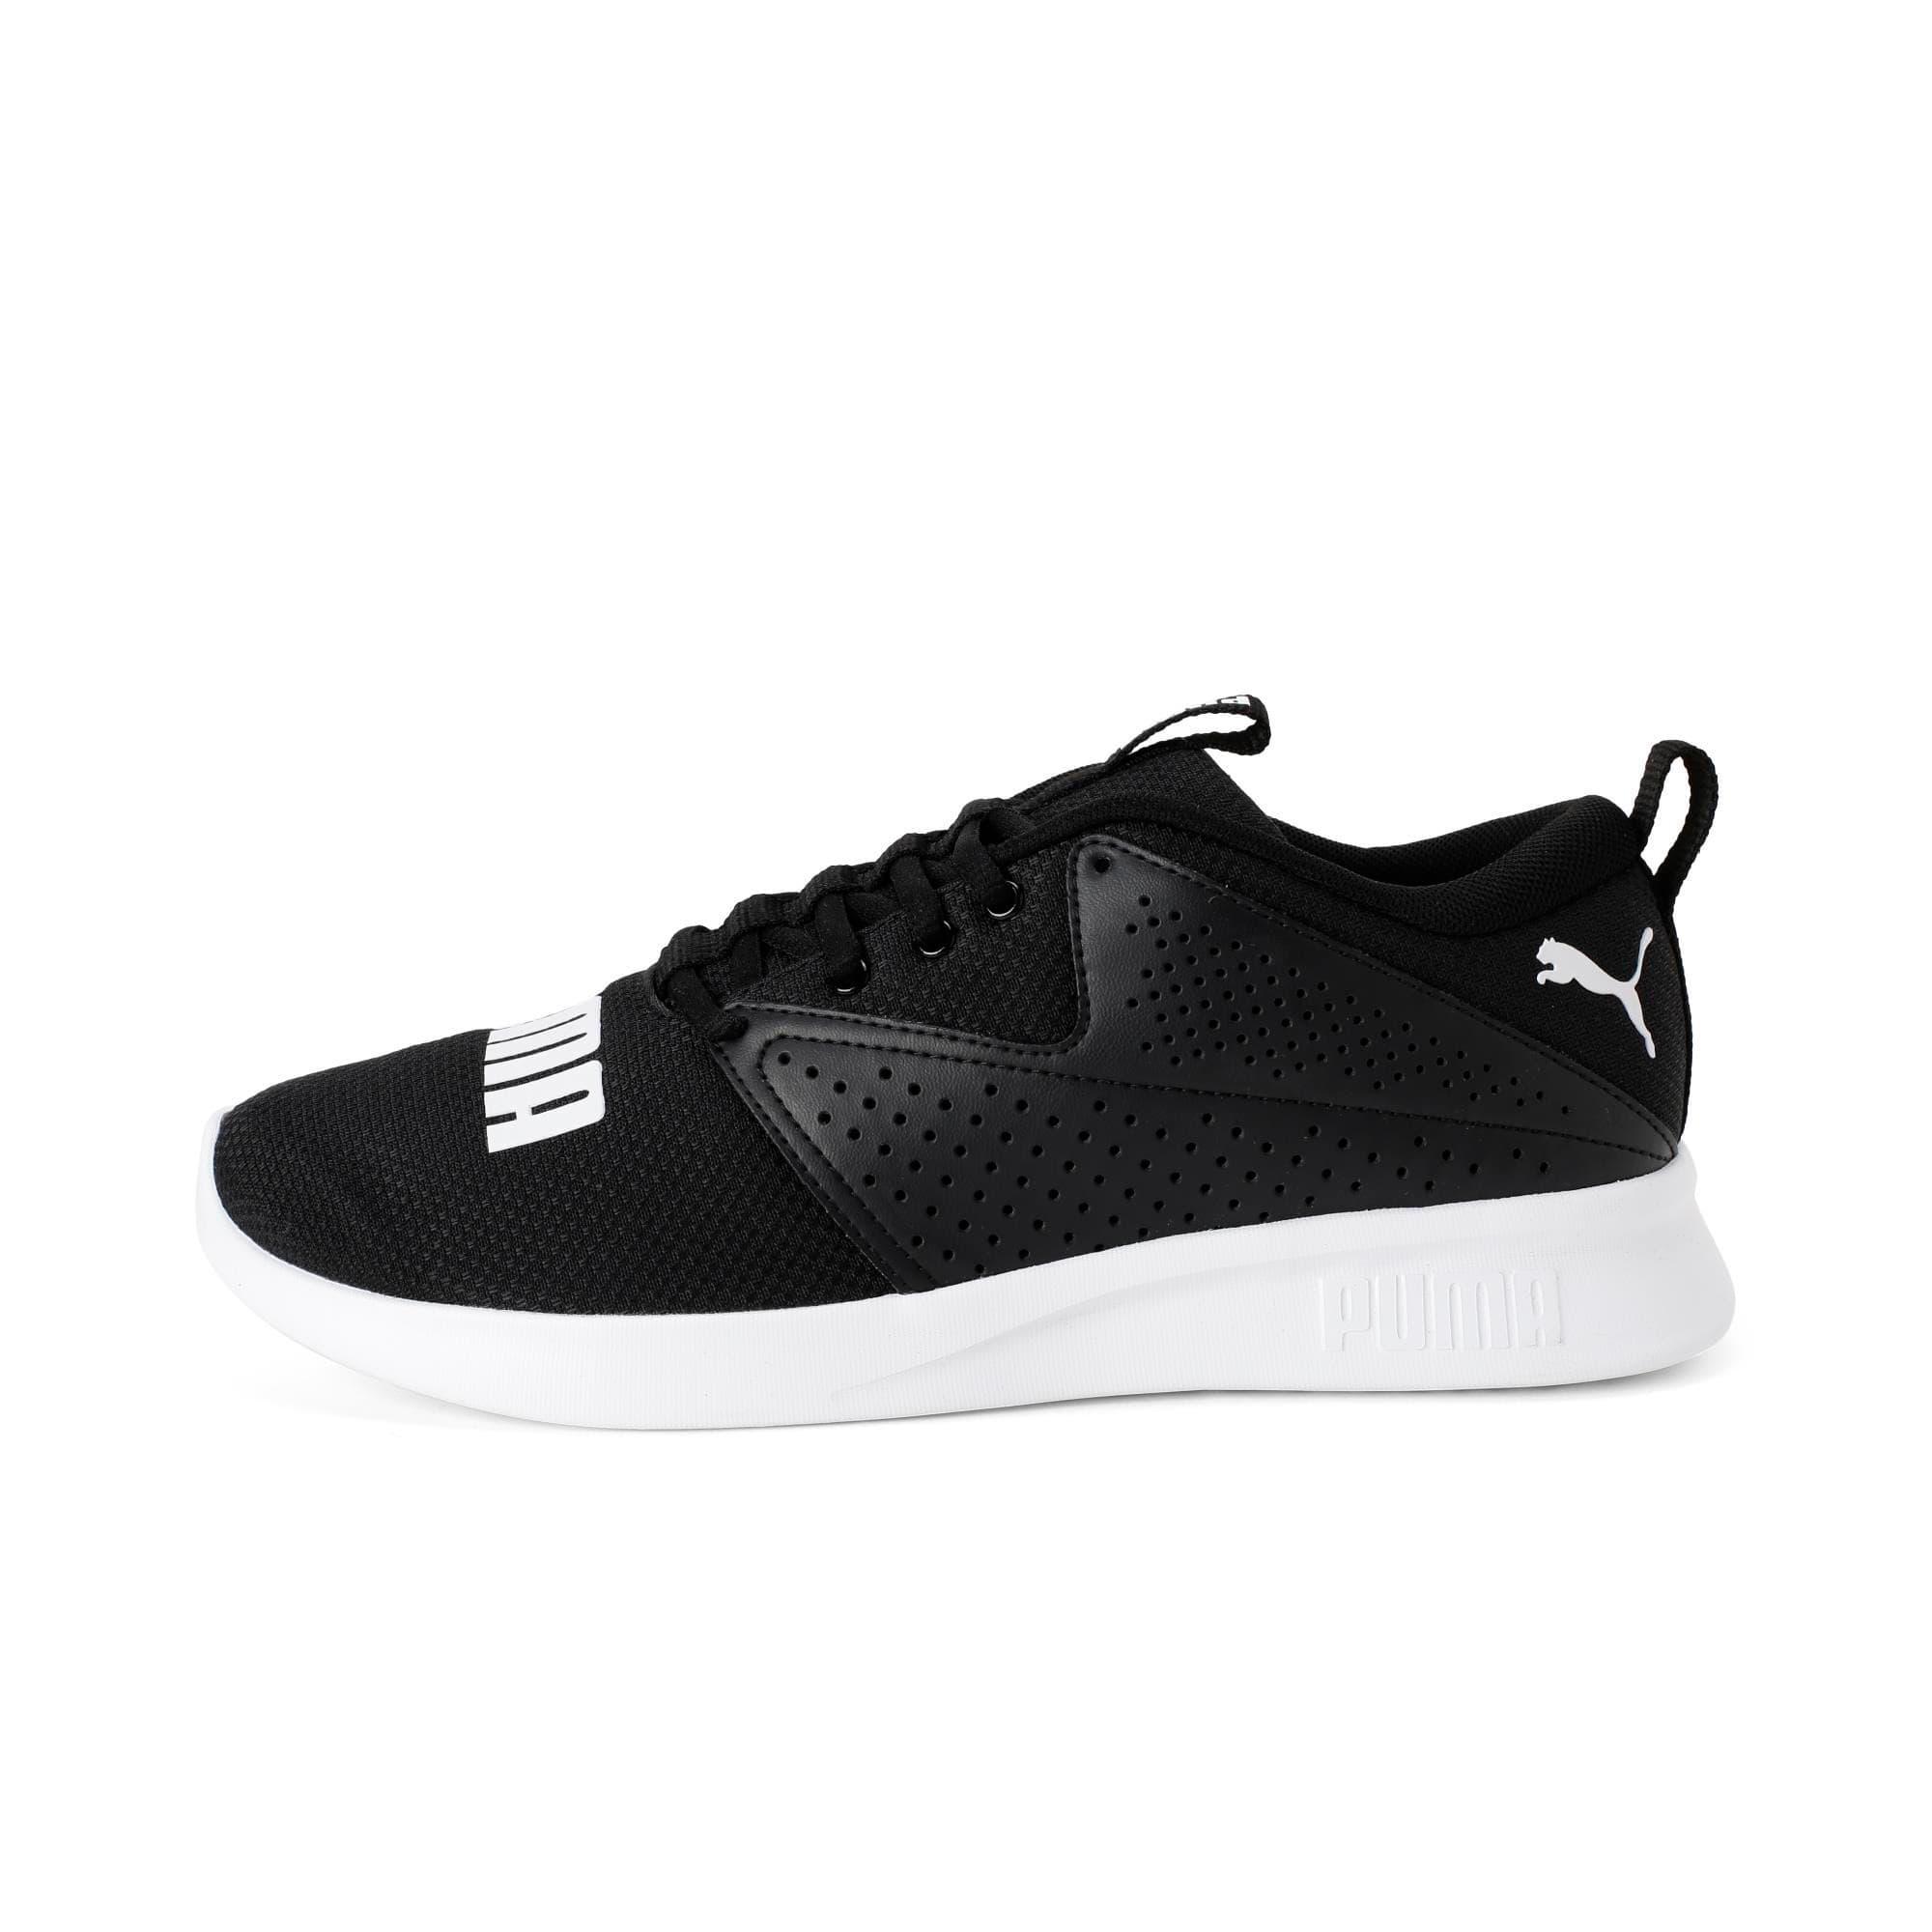 Thumbnail 1 of Detector Men's Running Shoe, Puma Black-Puma White, medium-IND